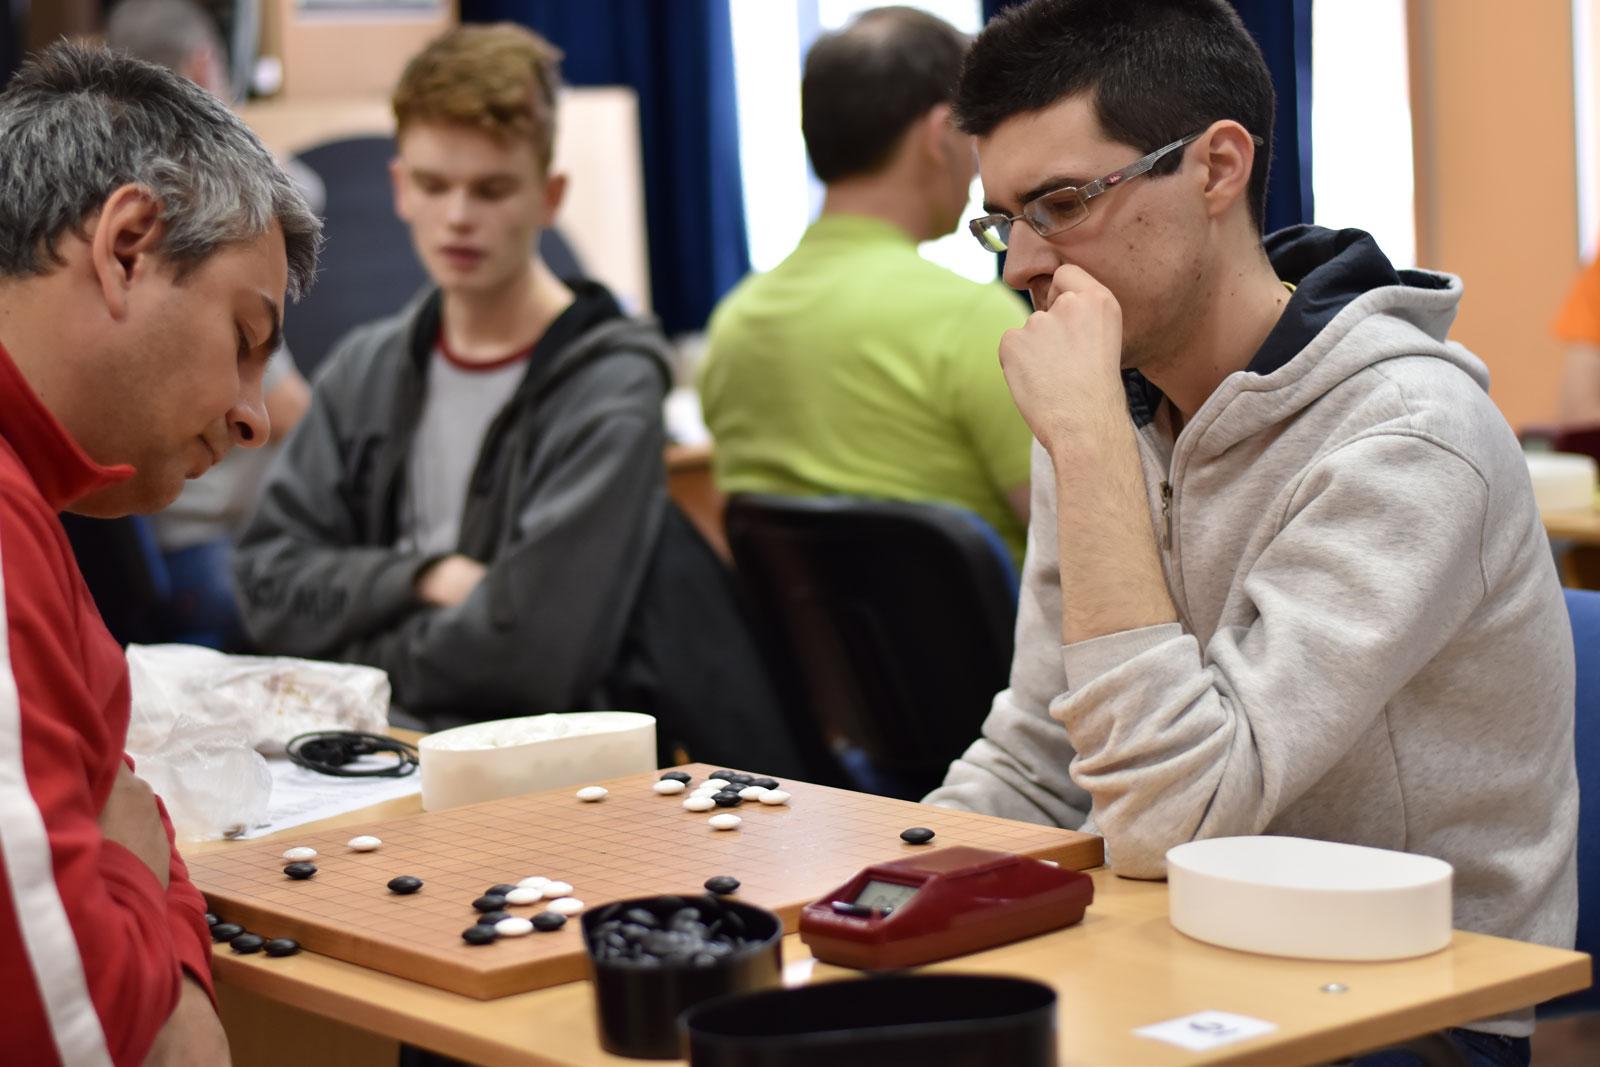 U Nišu odigran Međunarodni turnir u gou NIŠ OPEN 2017 (Foto)